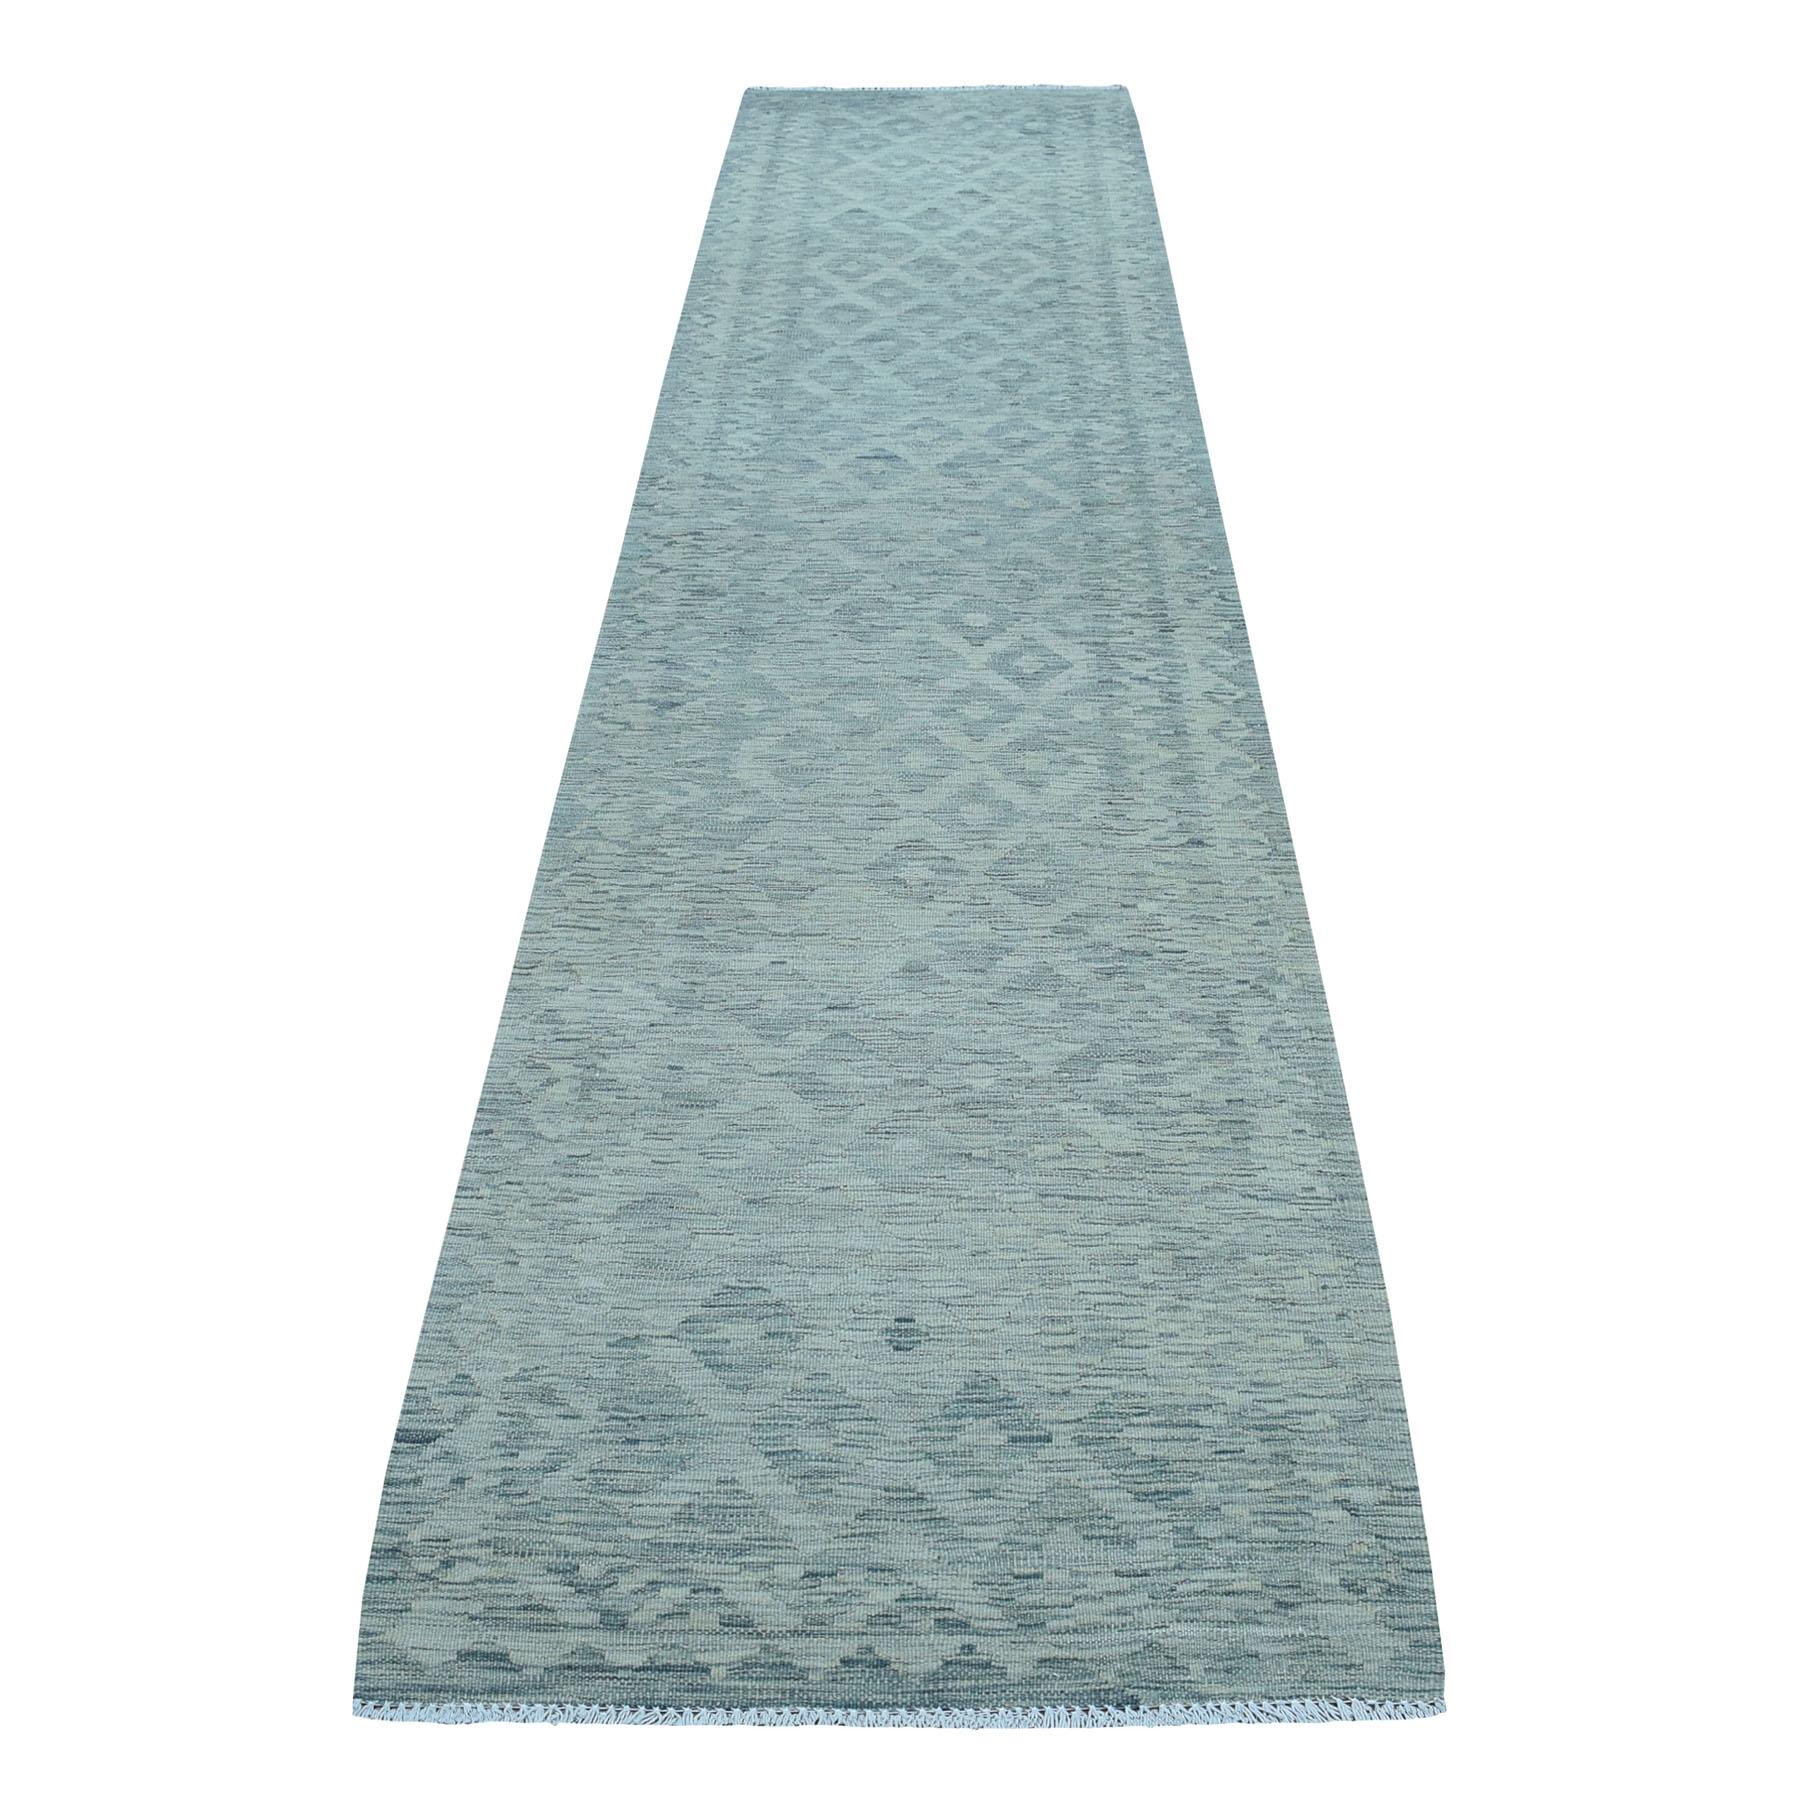 "2'8""x12'8"" Gray Shades Flat Weave Kilim Pure Wool Hand Woven Runner Oriental Rug 53816"